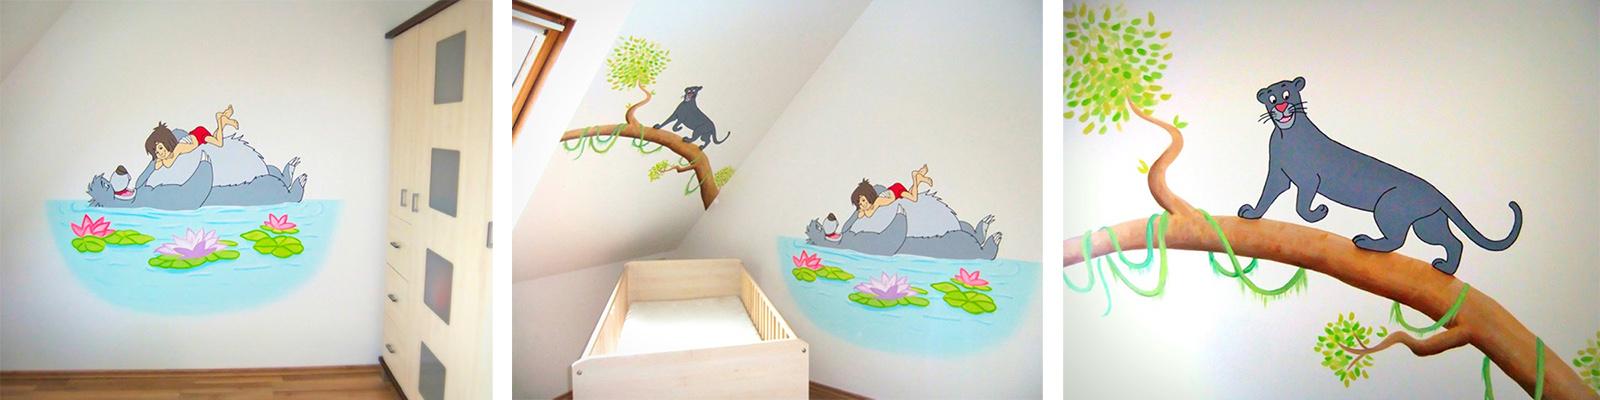 sweetwall wunschmotive f r deine wand wandmalerei f r kinderzimmer kinderzimmer. Black Bedroom Furniture Sets. Home Design Ideas